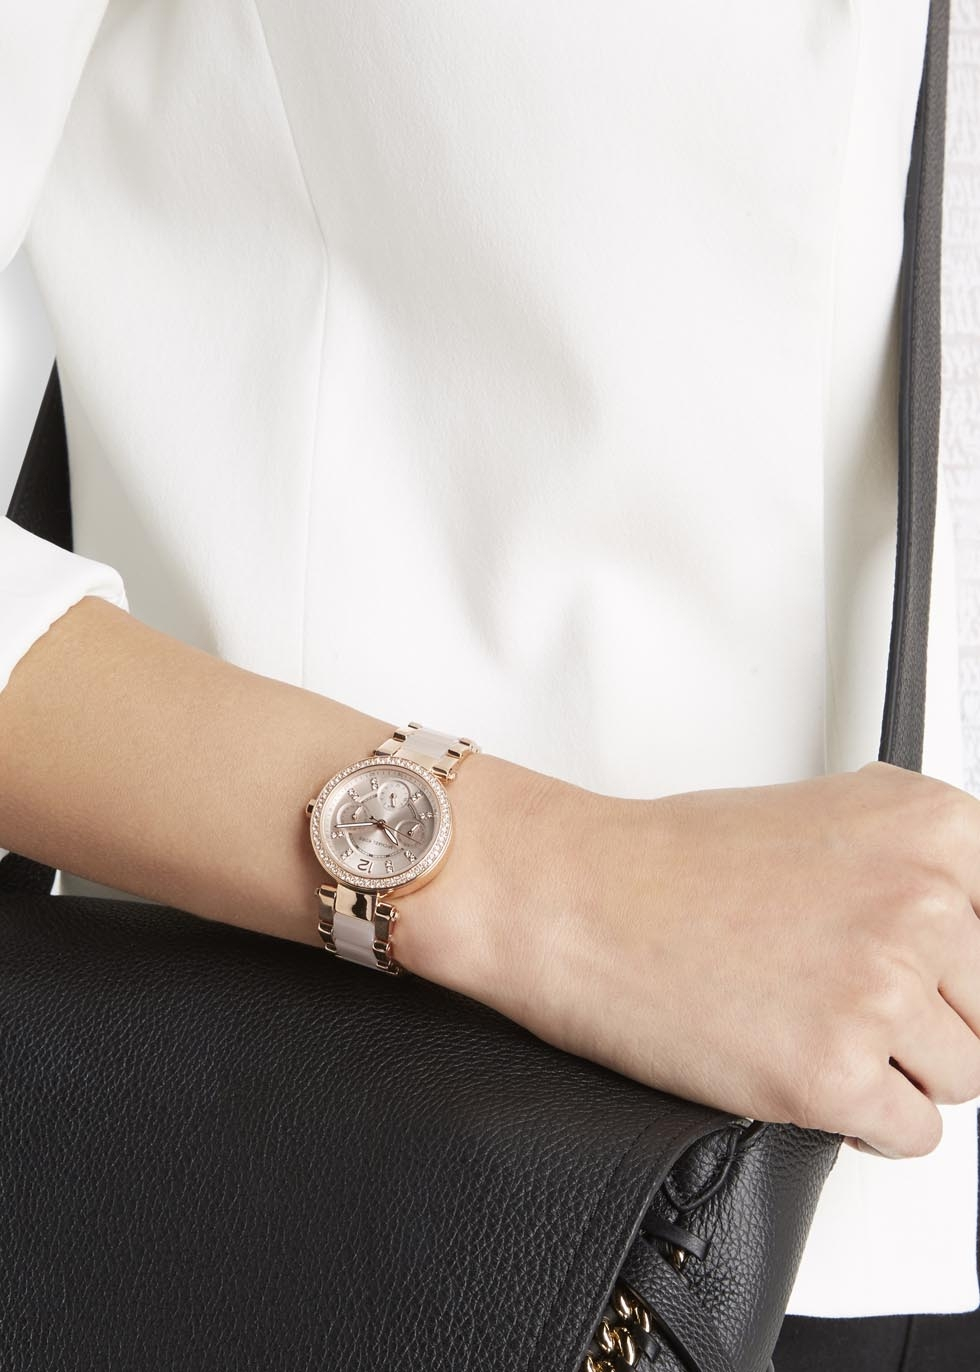 acb2f2b53b68 Michael Kors Mini Parker Rose Gold-tone Chronograph Watch in Pink - Lyst